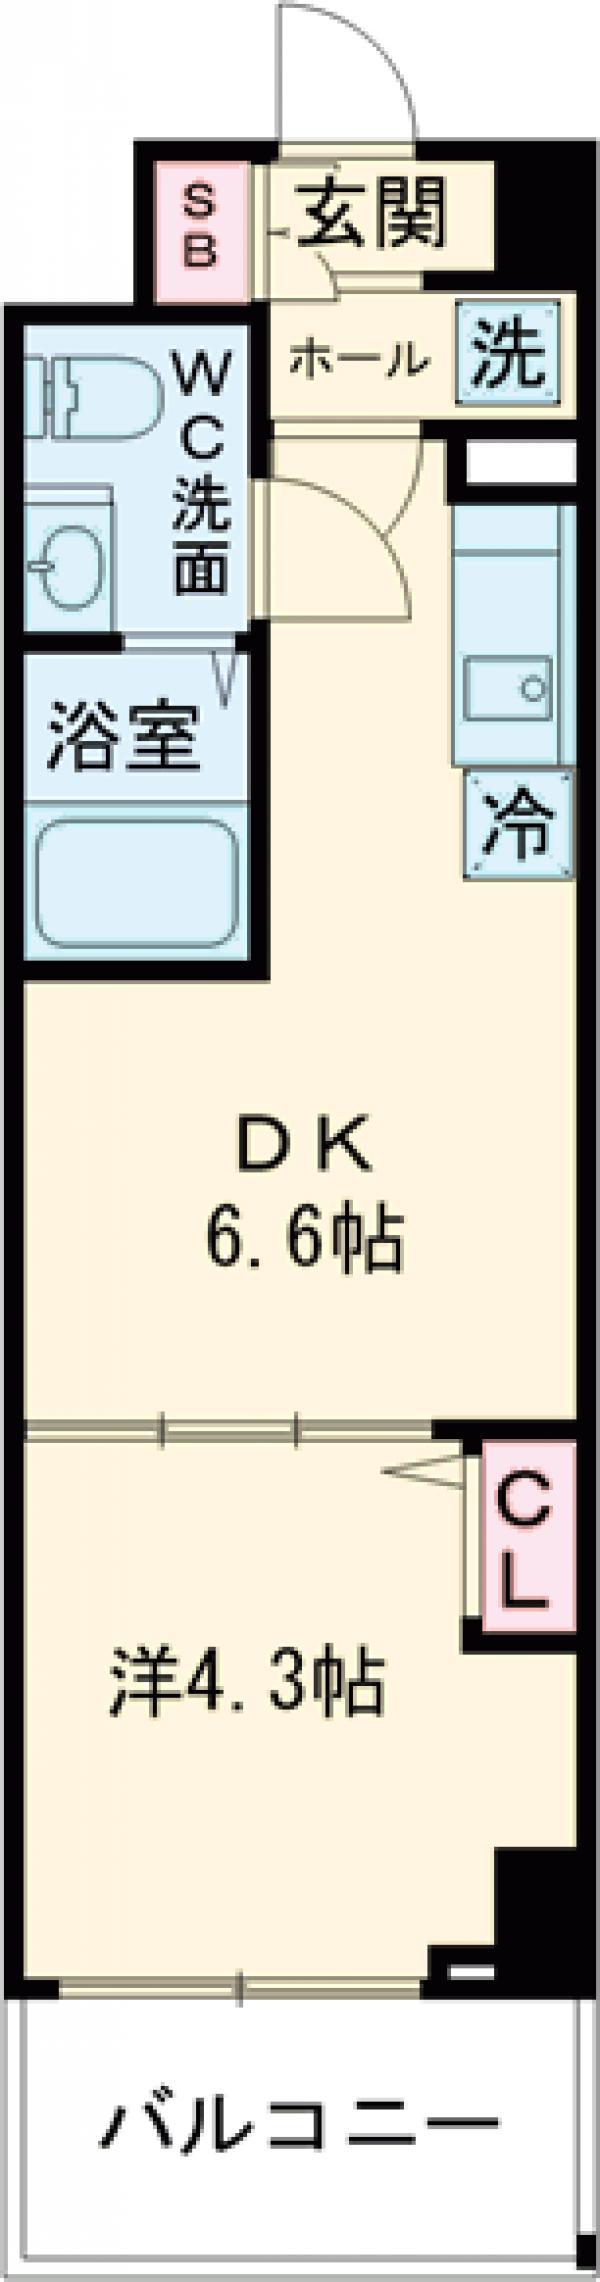 KDXレジデンス梅島・308号室の間取り